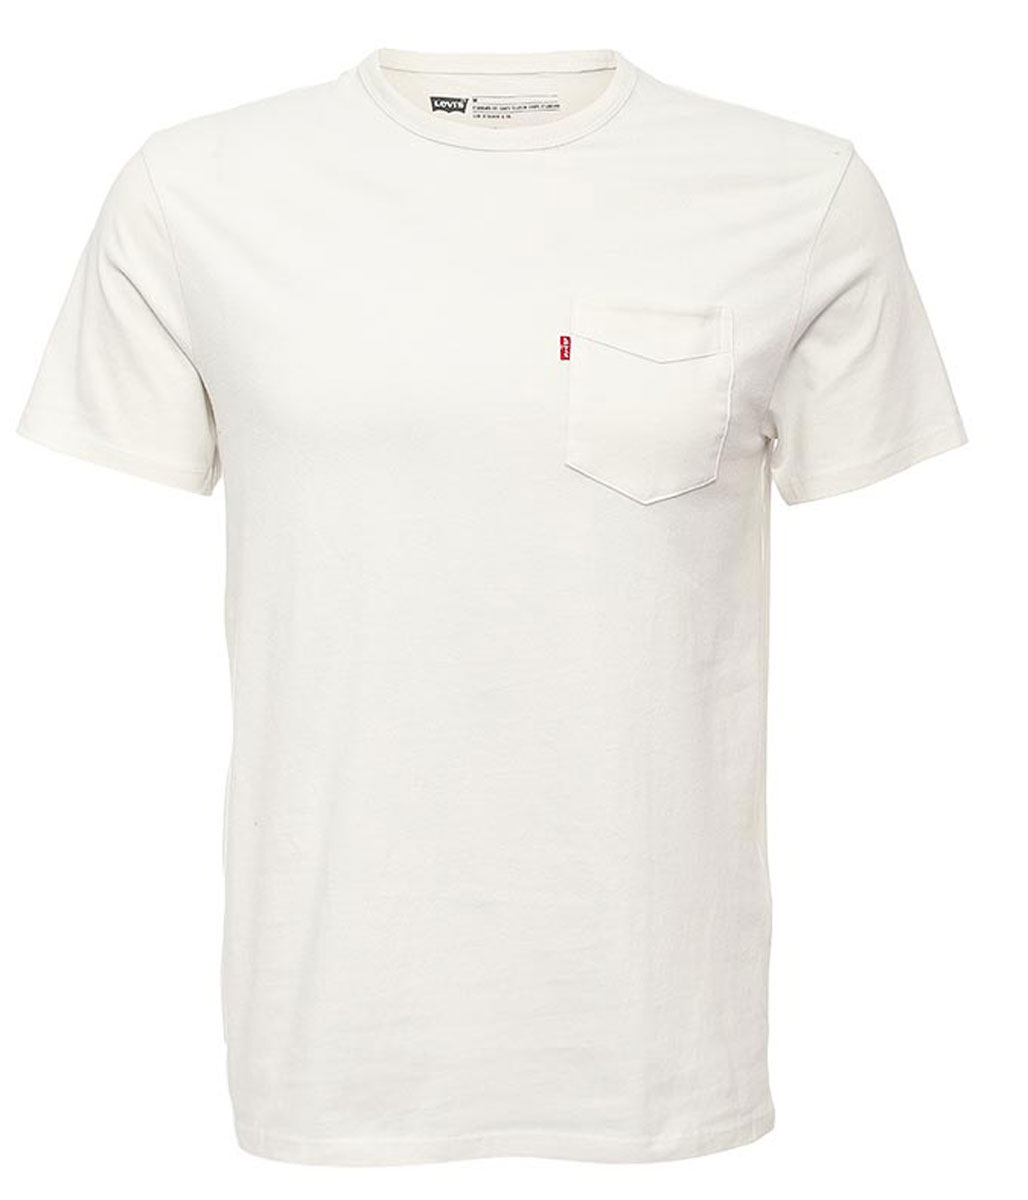 Футболка мужская Levi's®, цвет: белый. 1579800040. Размер L (50) футболка мужская levi s® цвет белый 2 шт 8217600020 размер l 50